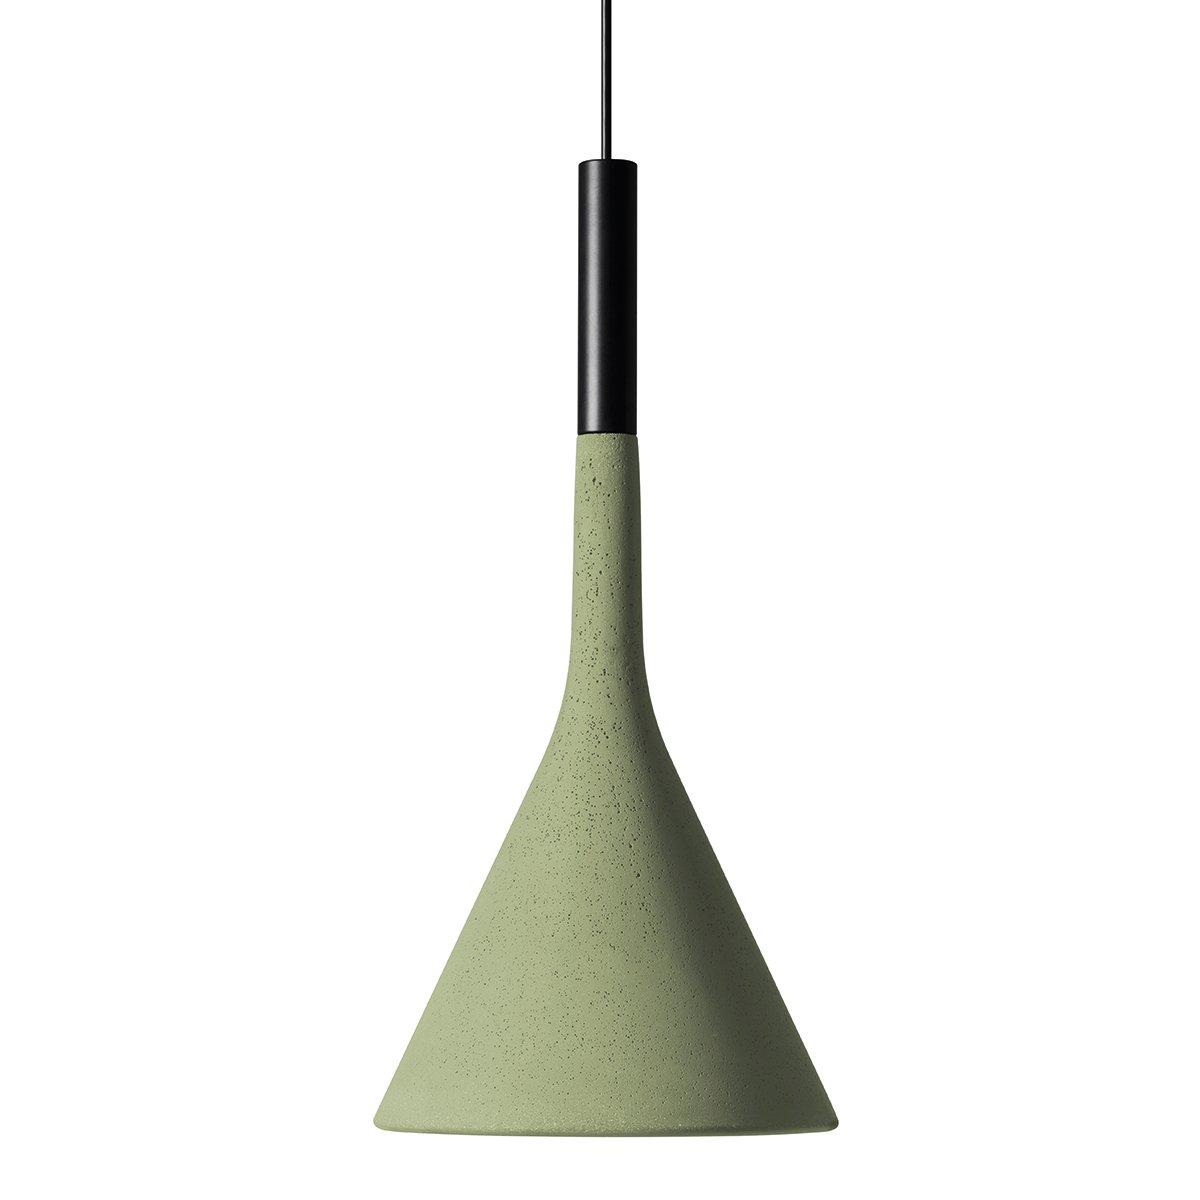 Foscarini Aplomb Outdoor Hanglamp - Lucidi e Pevere